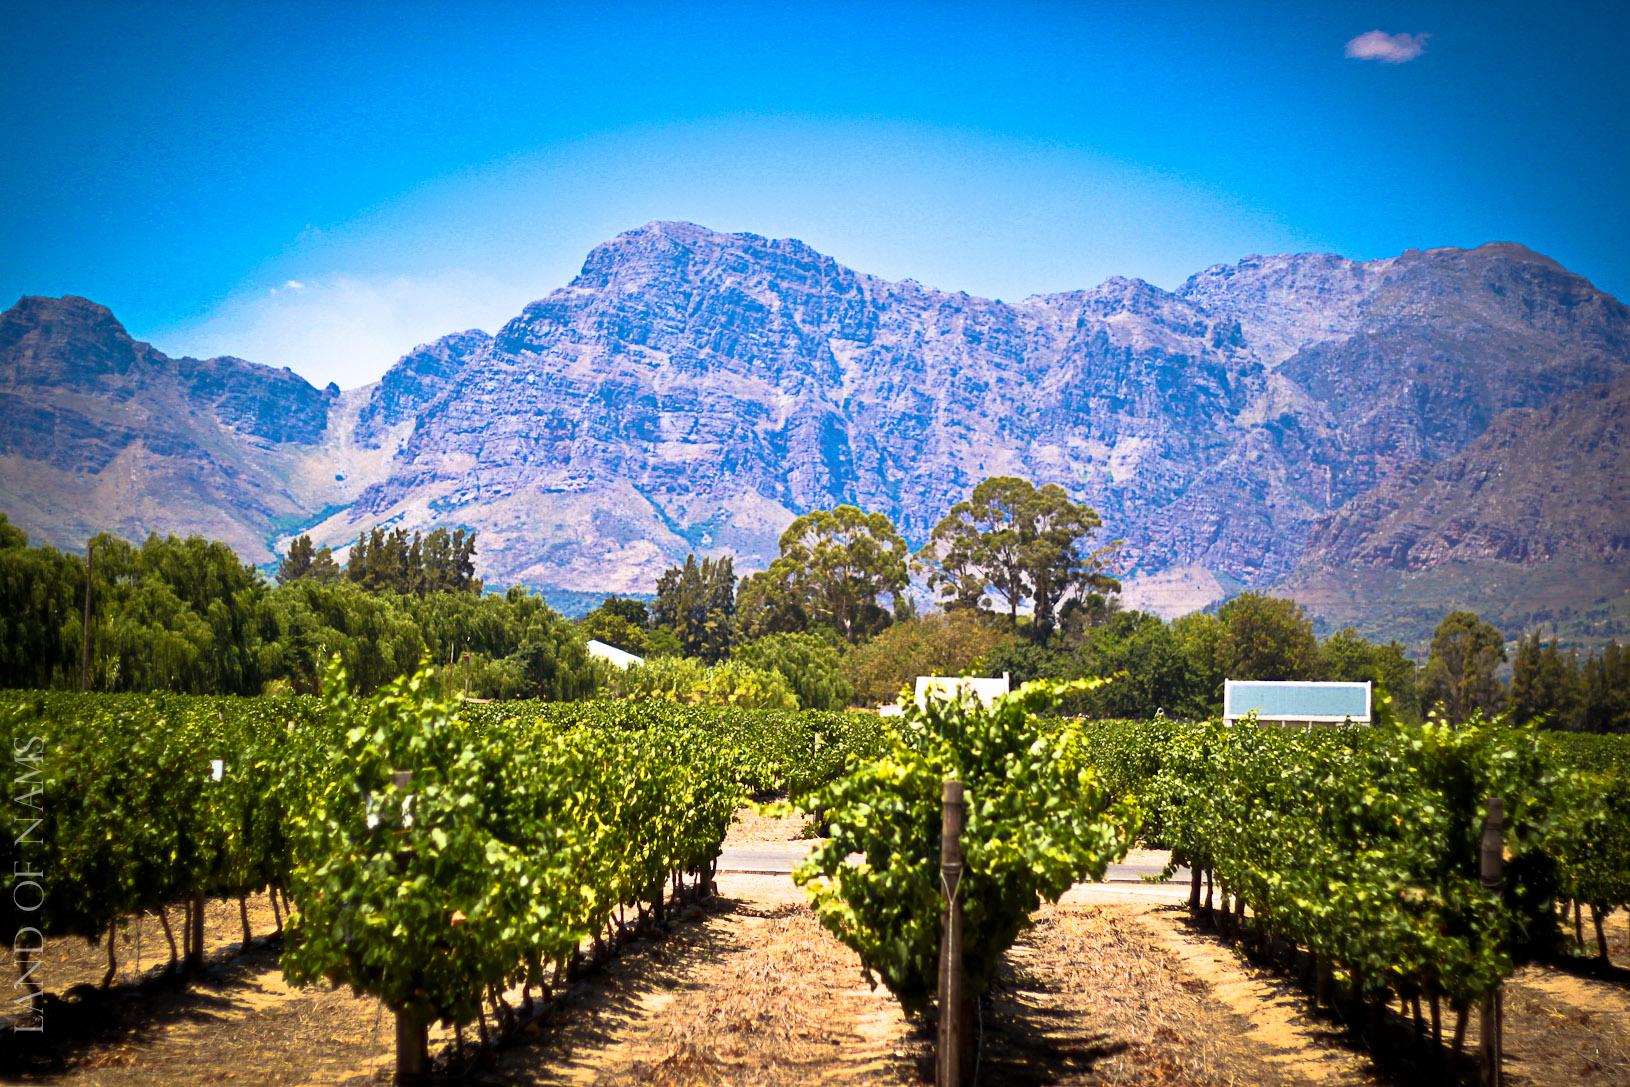 : Nederburg Wine Farm in Paarl, Western Cape | land of nams